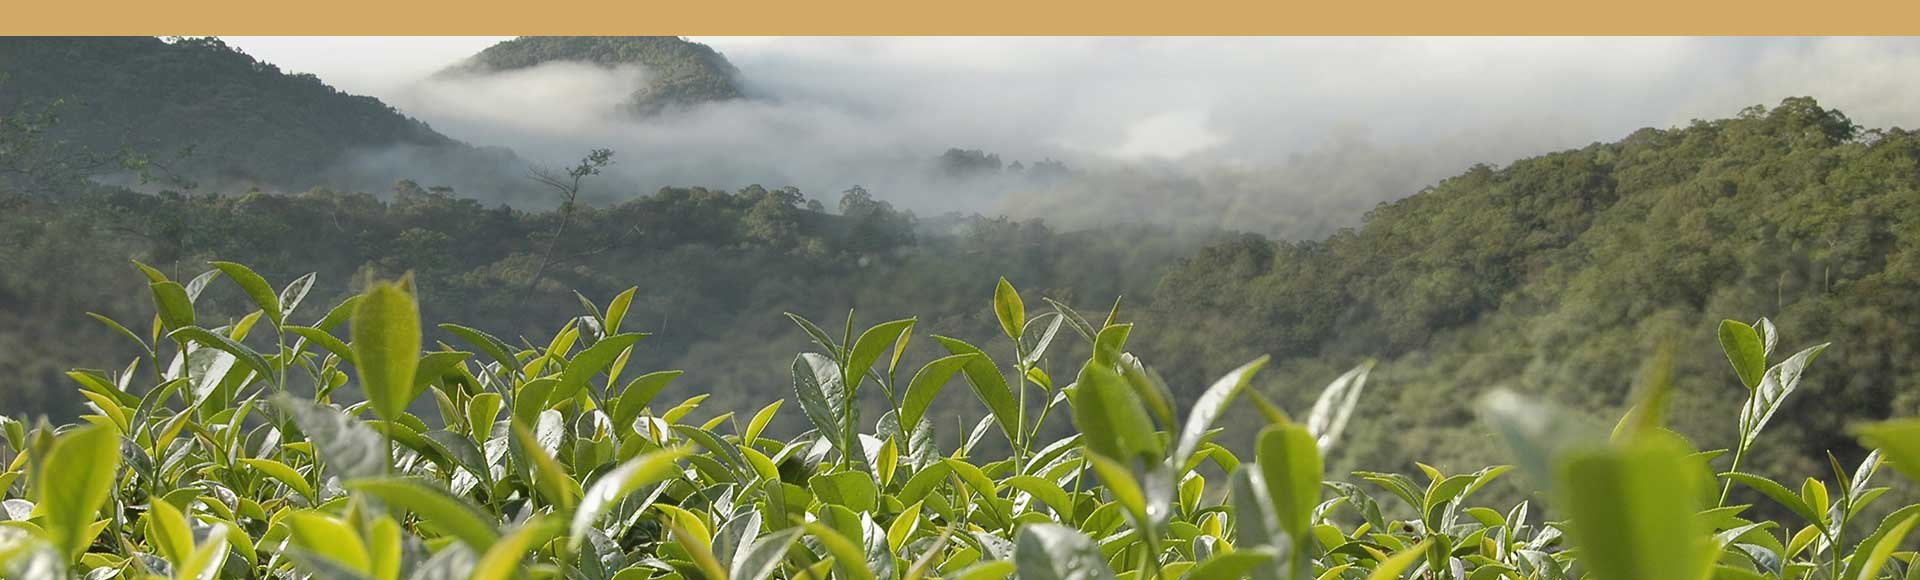 Taiwan plantacion de te en la montaña